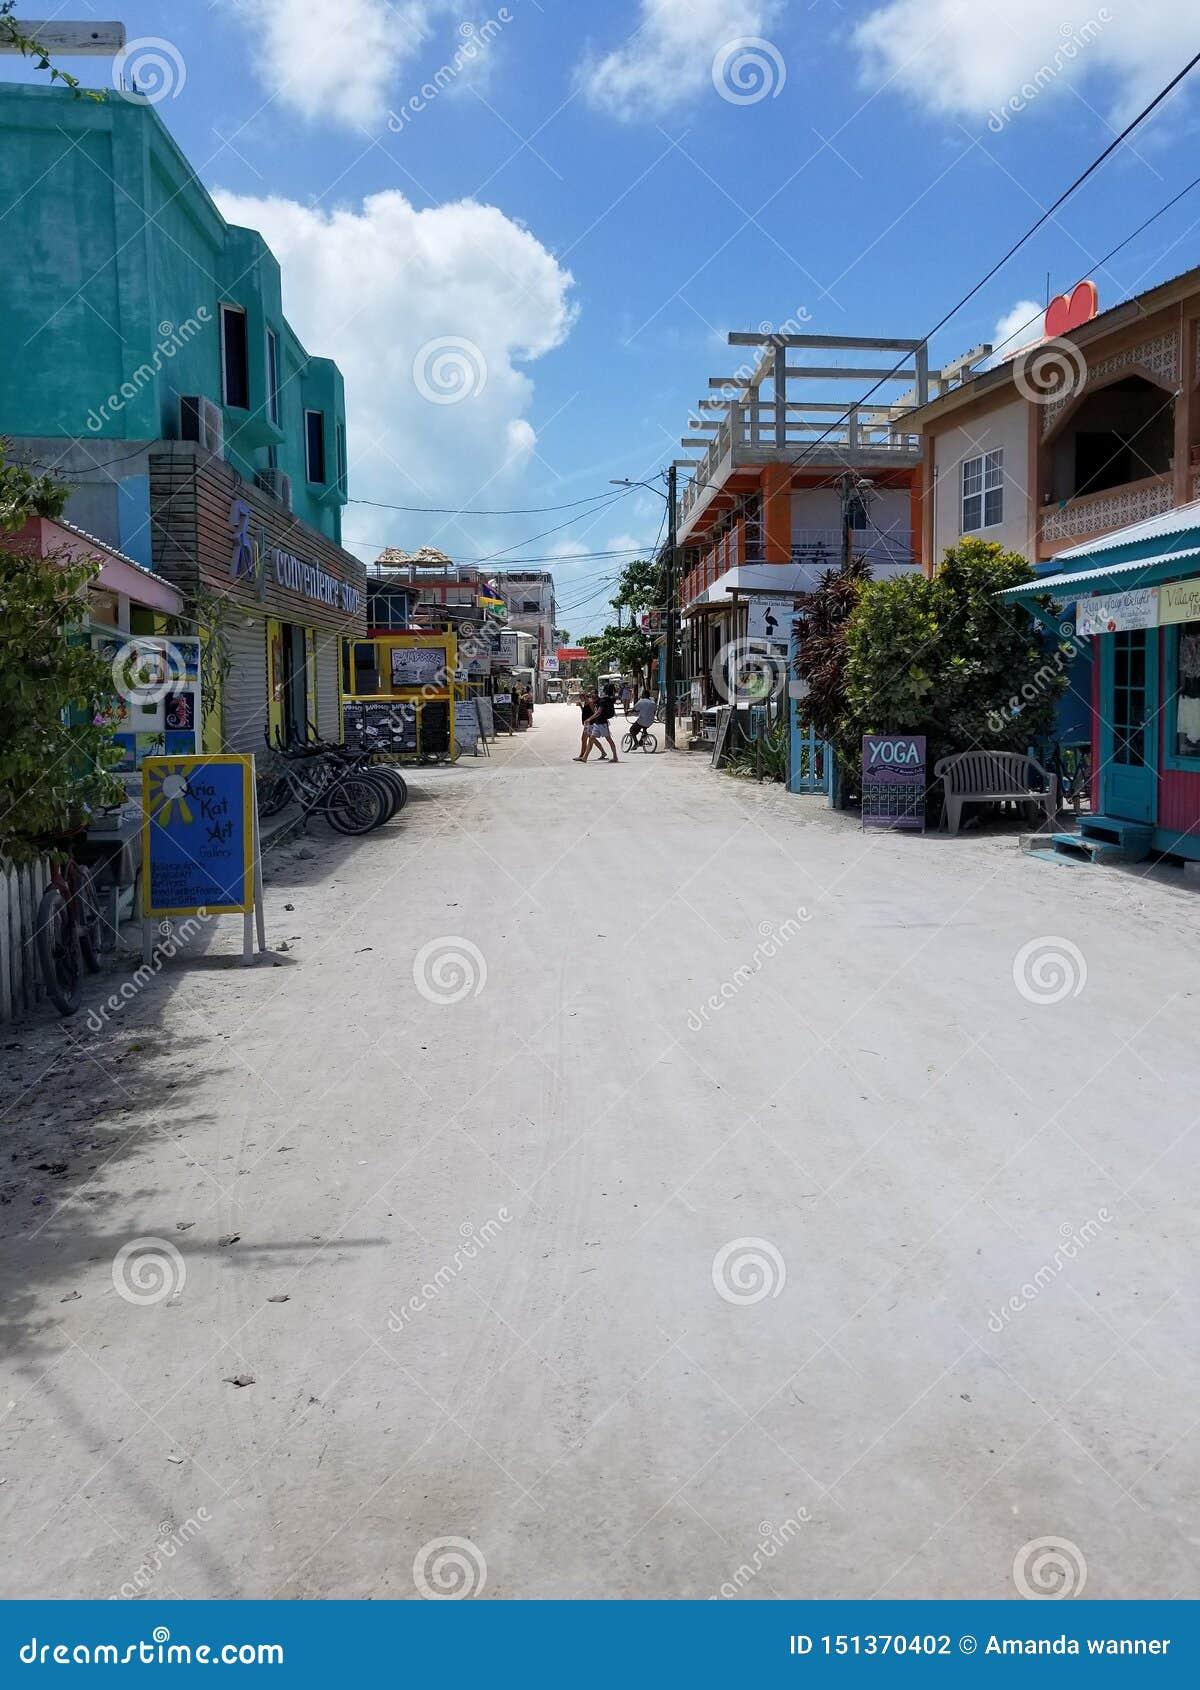 Calle peatonal en el calafate de Caye